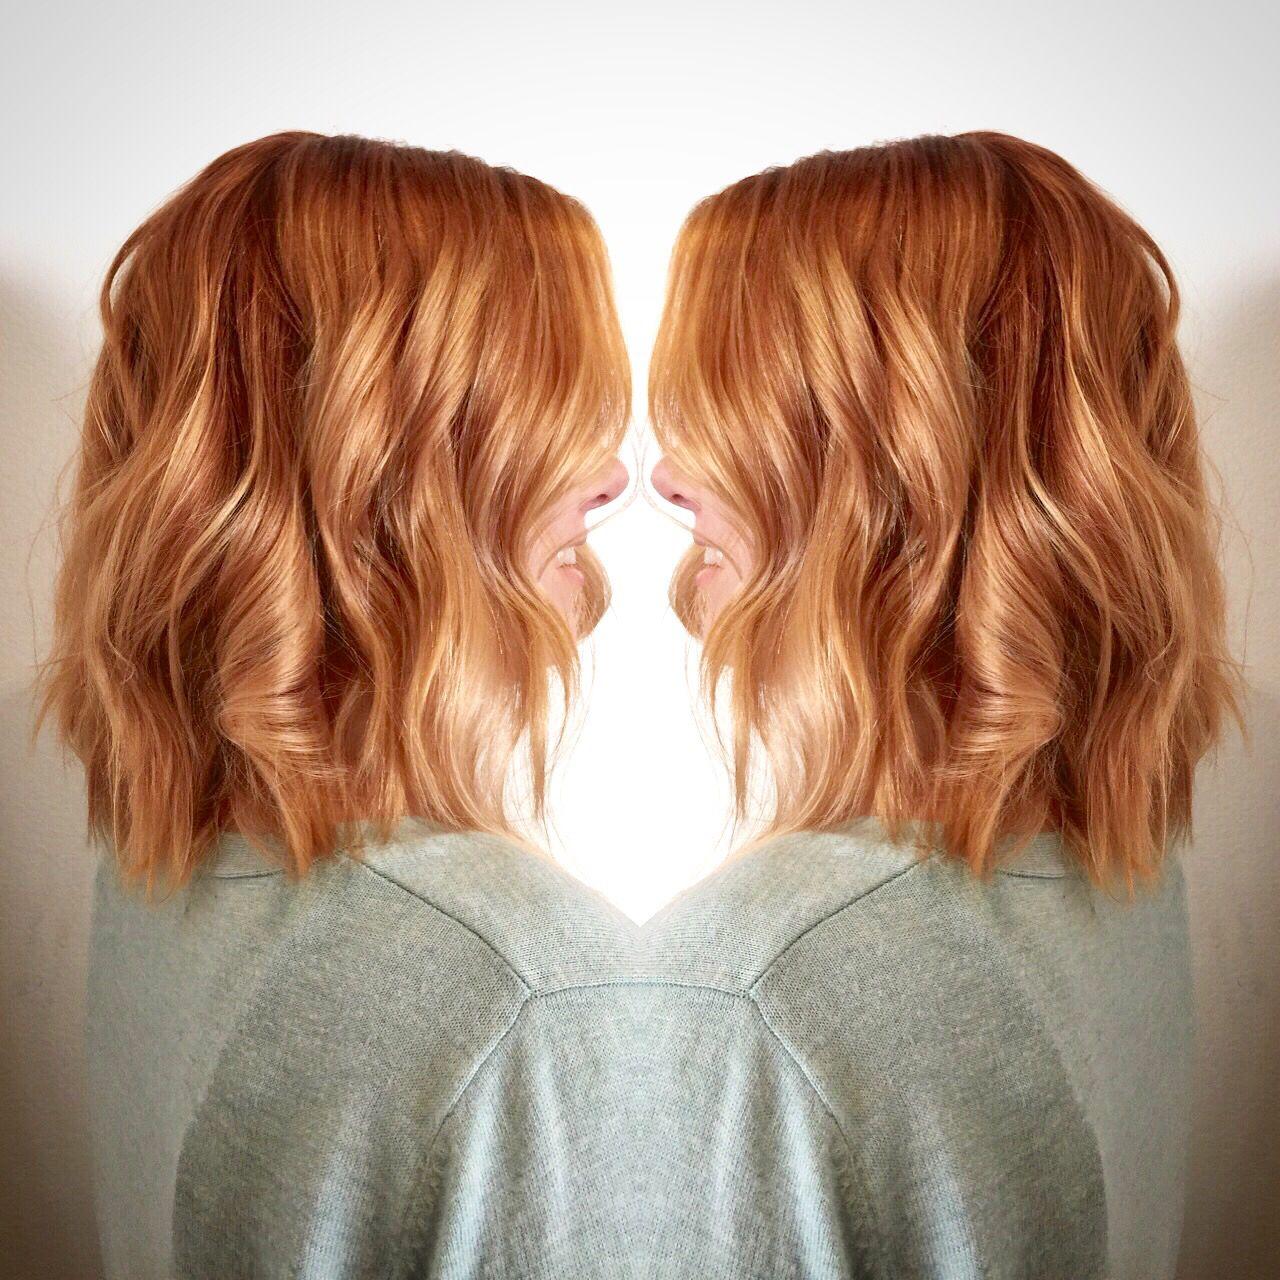 Copper Balayage By Jordan Hair In 2018 Pinterest Copper